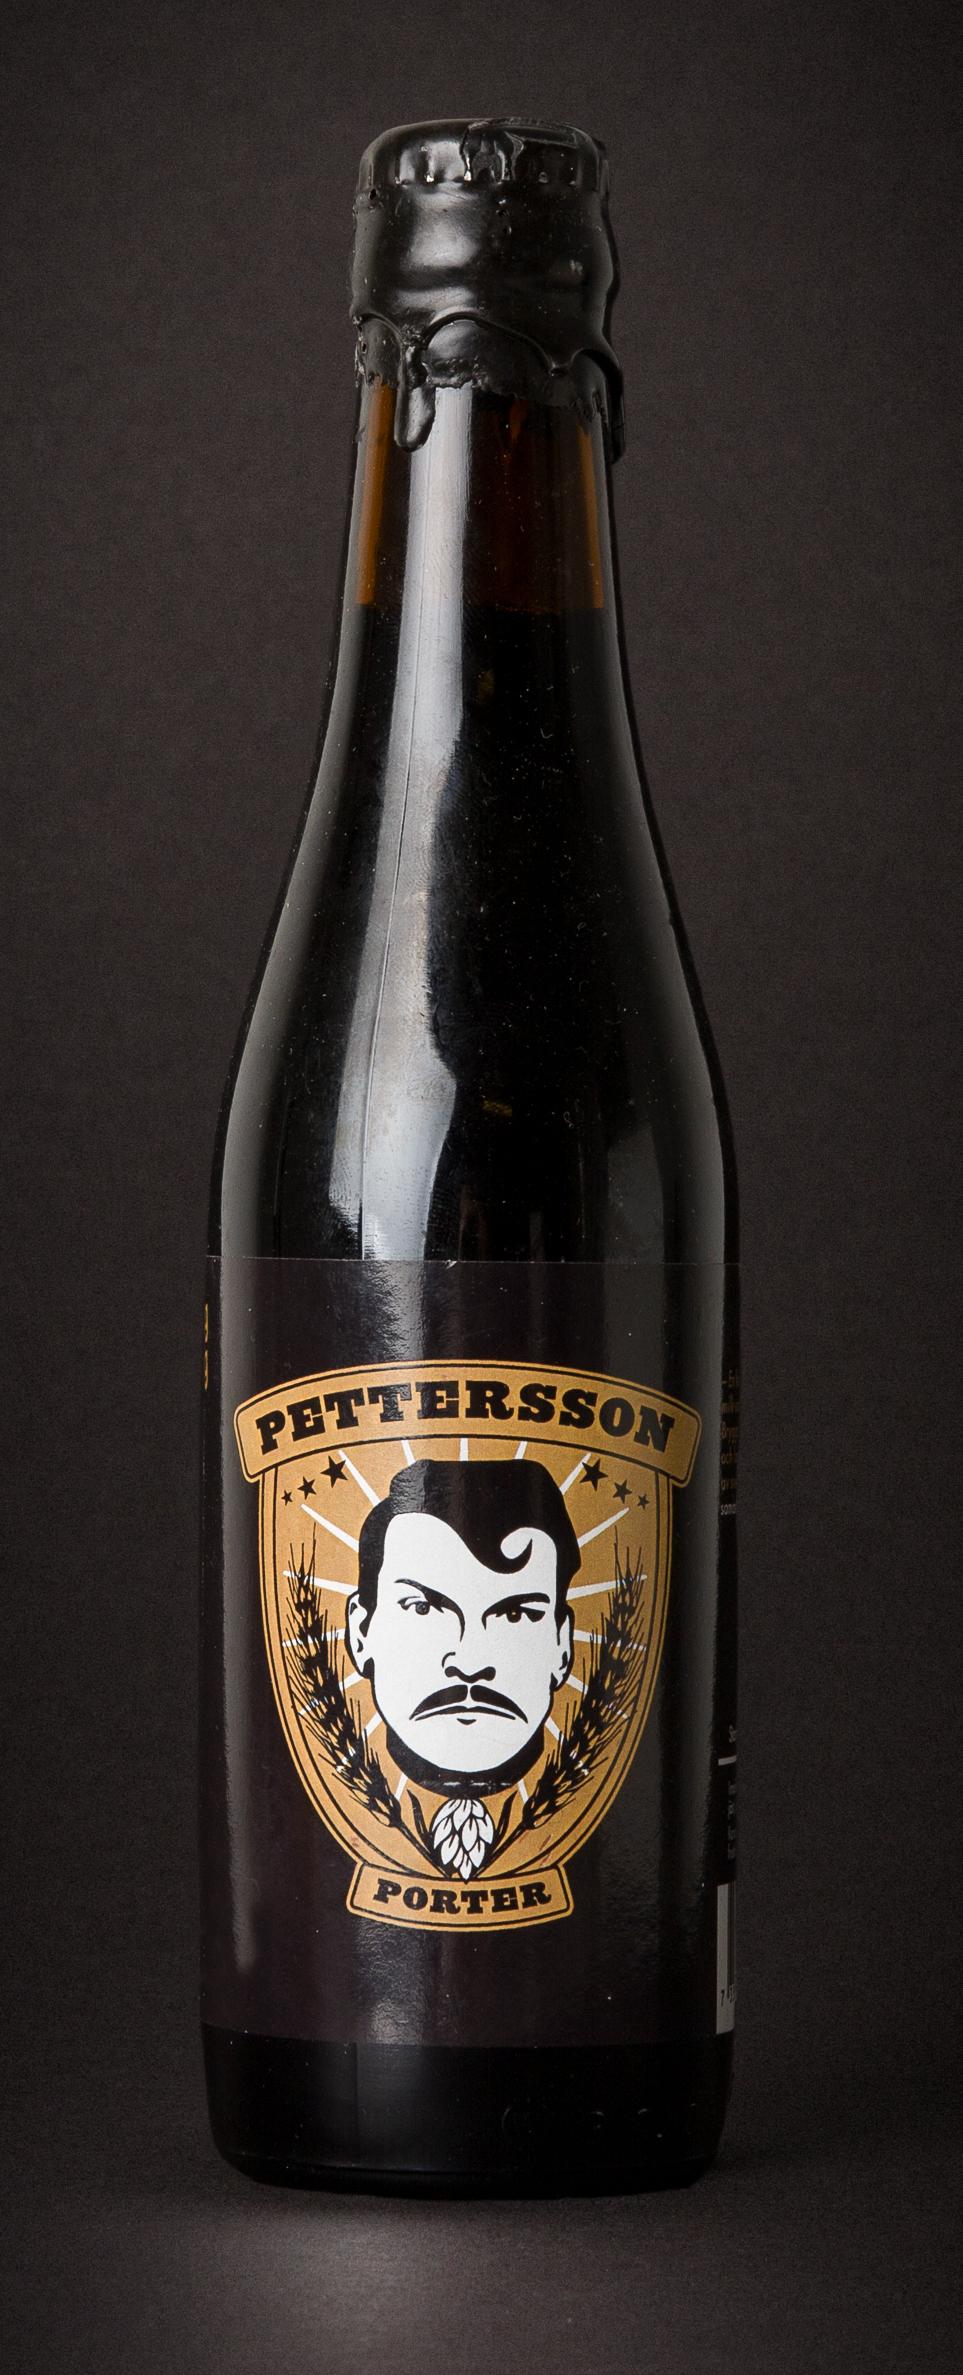 Pettersson Porter  Barrel Aged Imperial Stout 10,0% · 33 centiliter